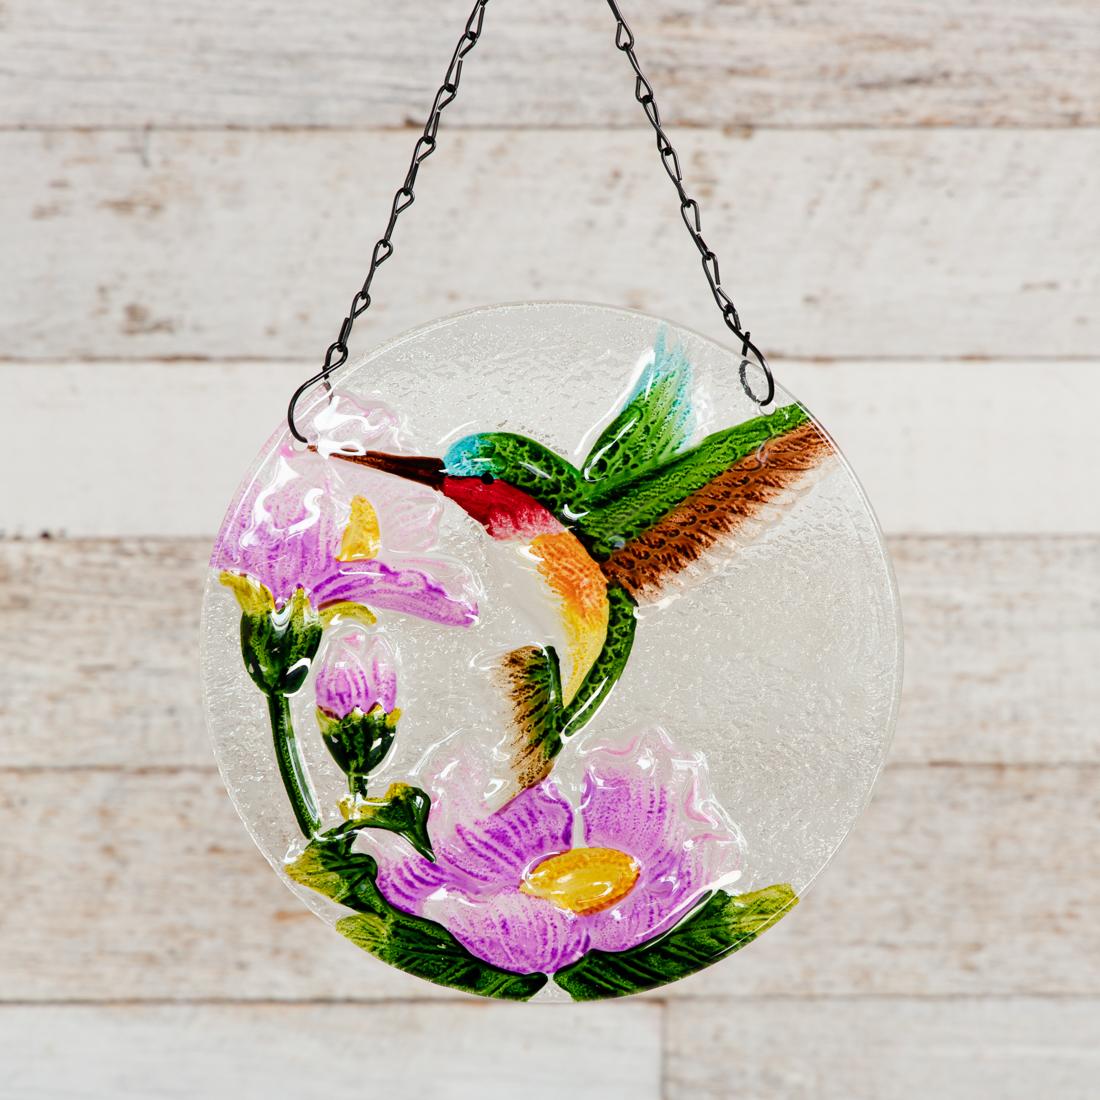 Glass Sun Catcher with Humingbird Design